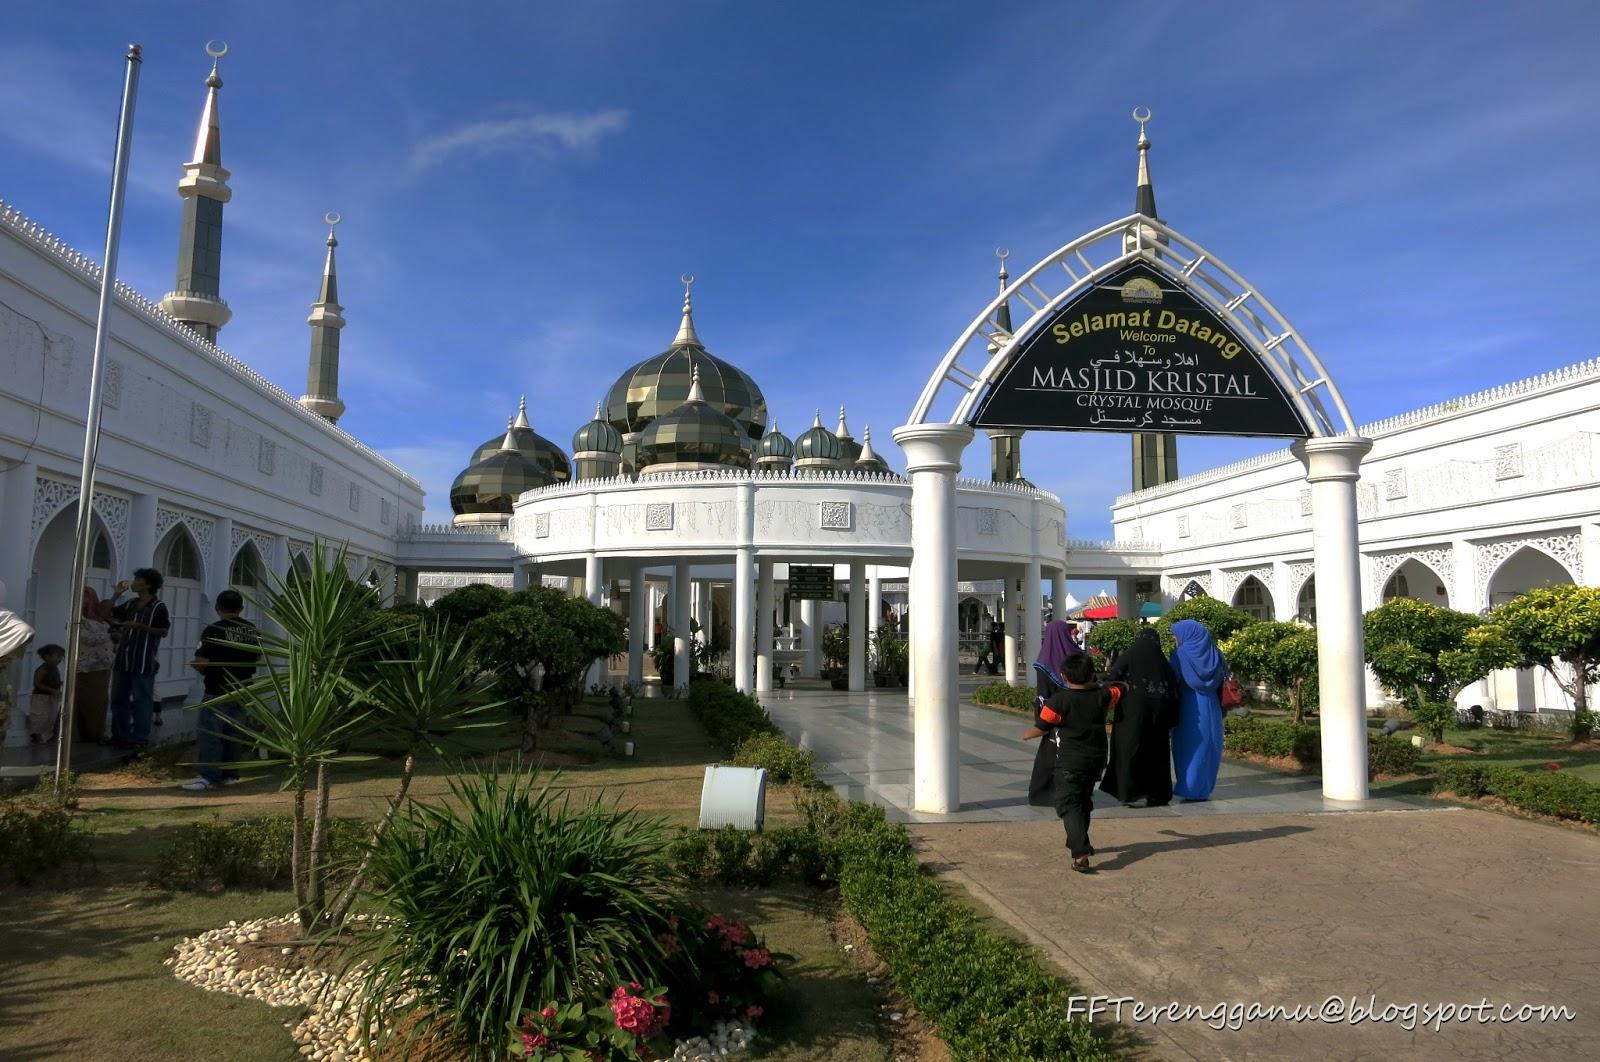 Jomm Terengganu Selalu...: Masjid Kristal, Kuala Terengganu